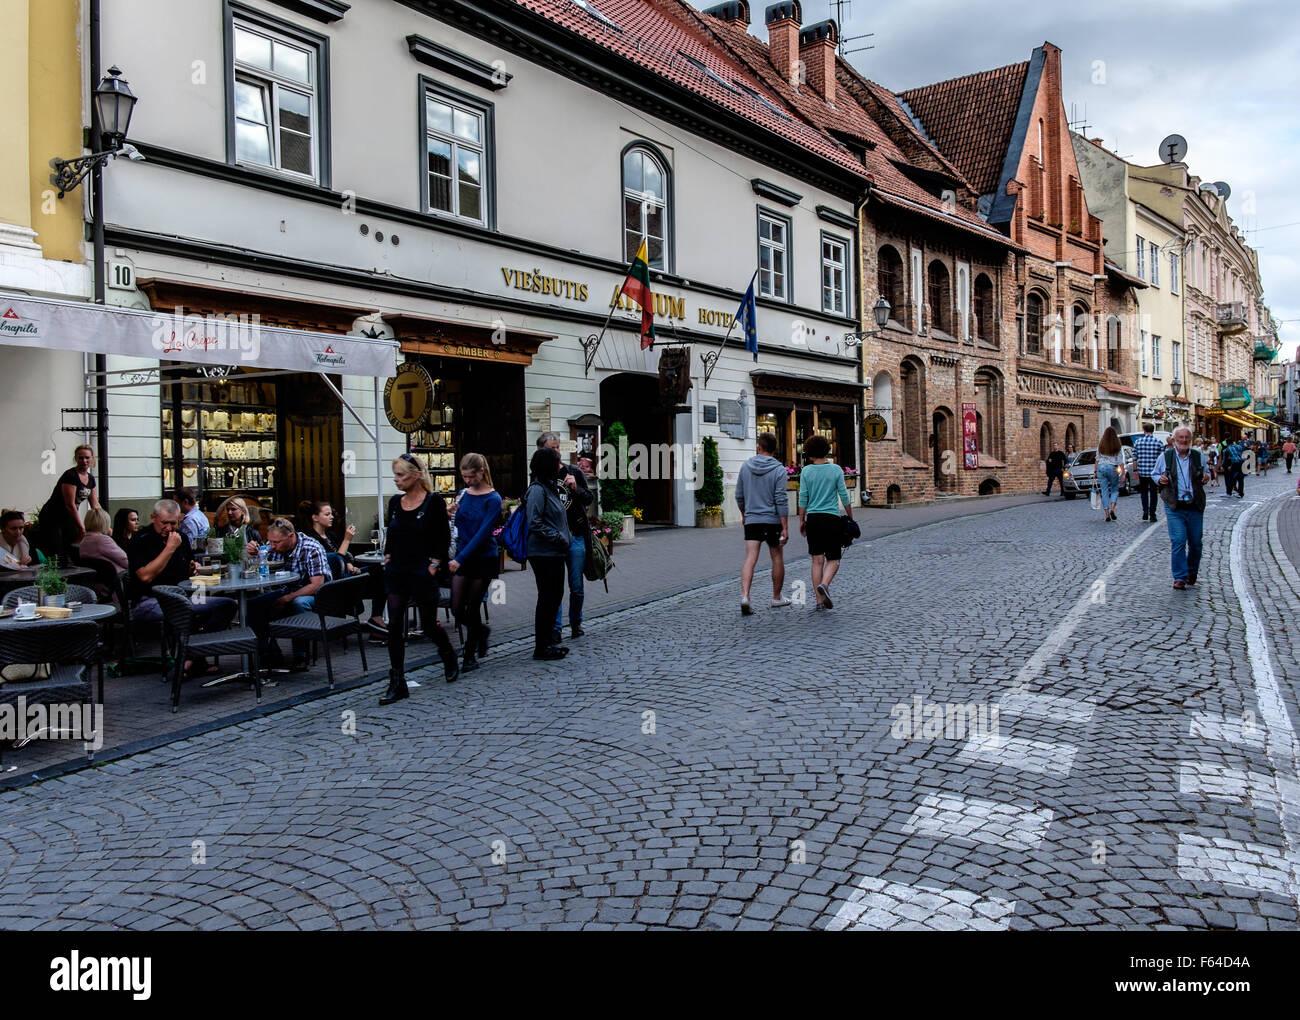 Rue avec des terrasses de cafés en Villnius, Lituanie Banque D'Images